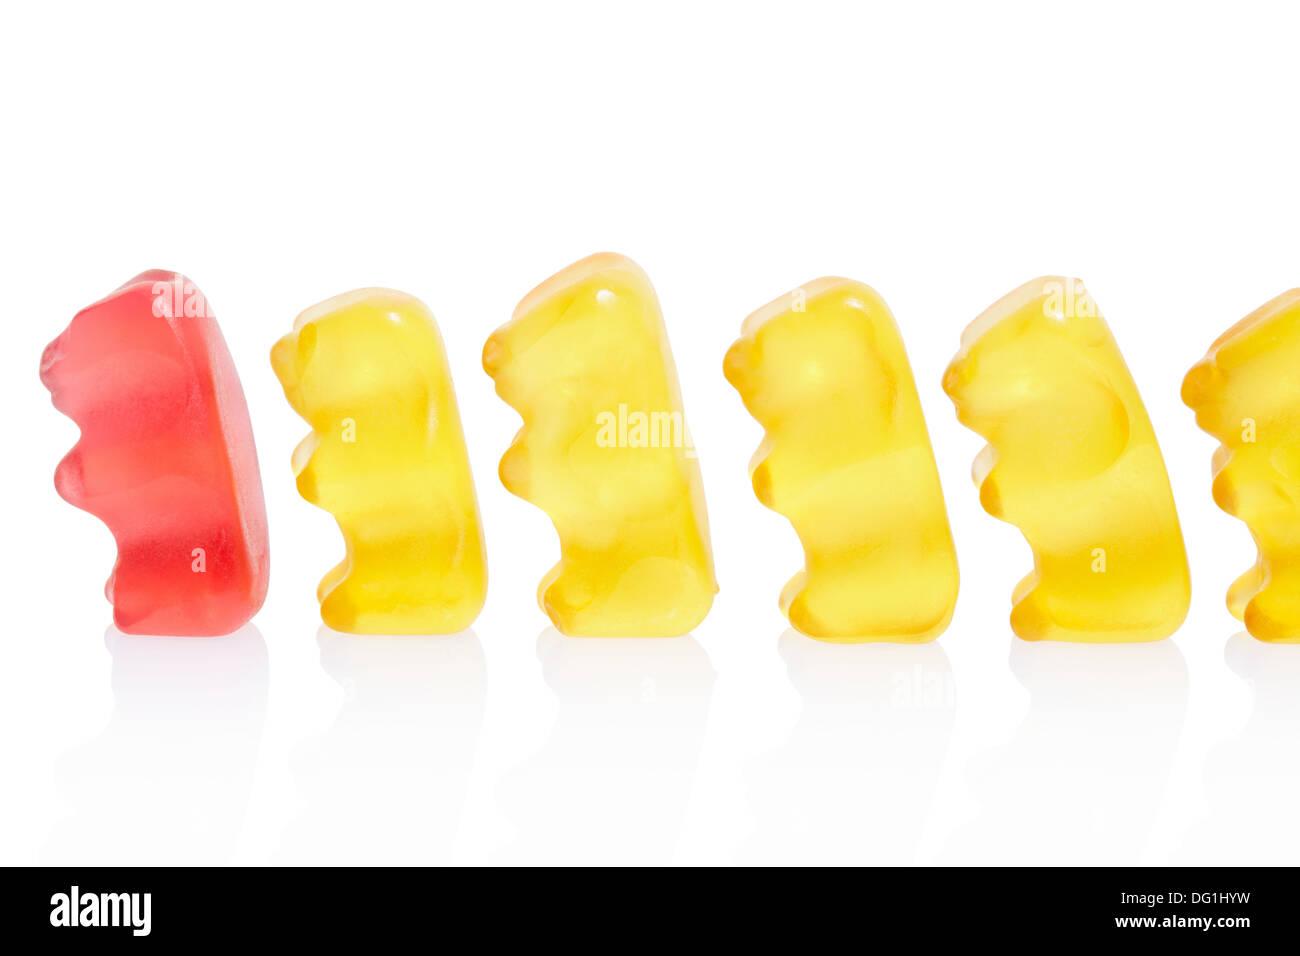 Gummy bears leader concept - Stock Image